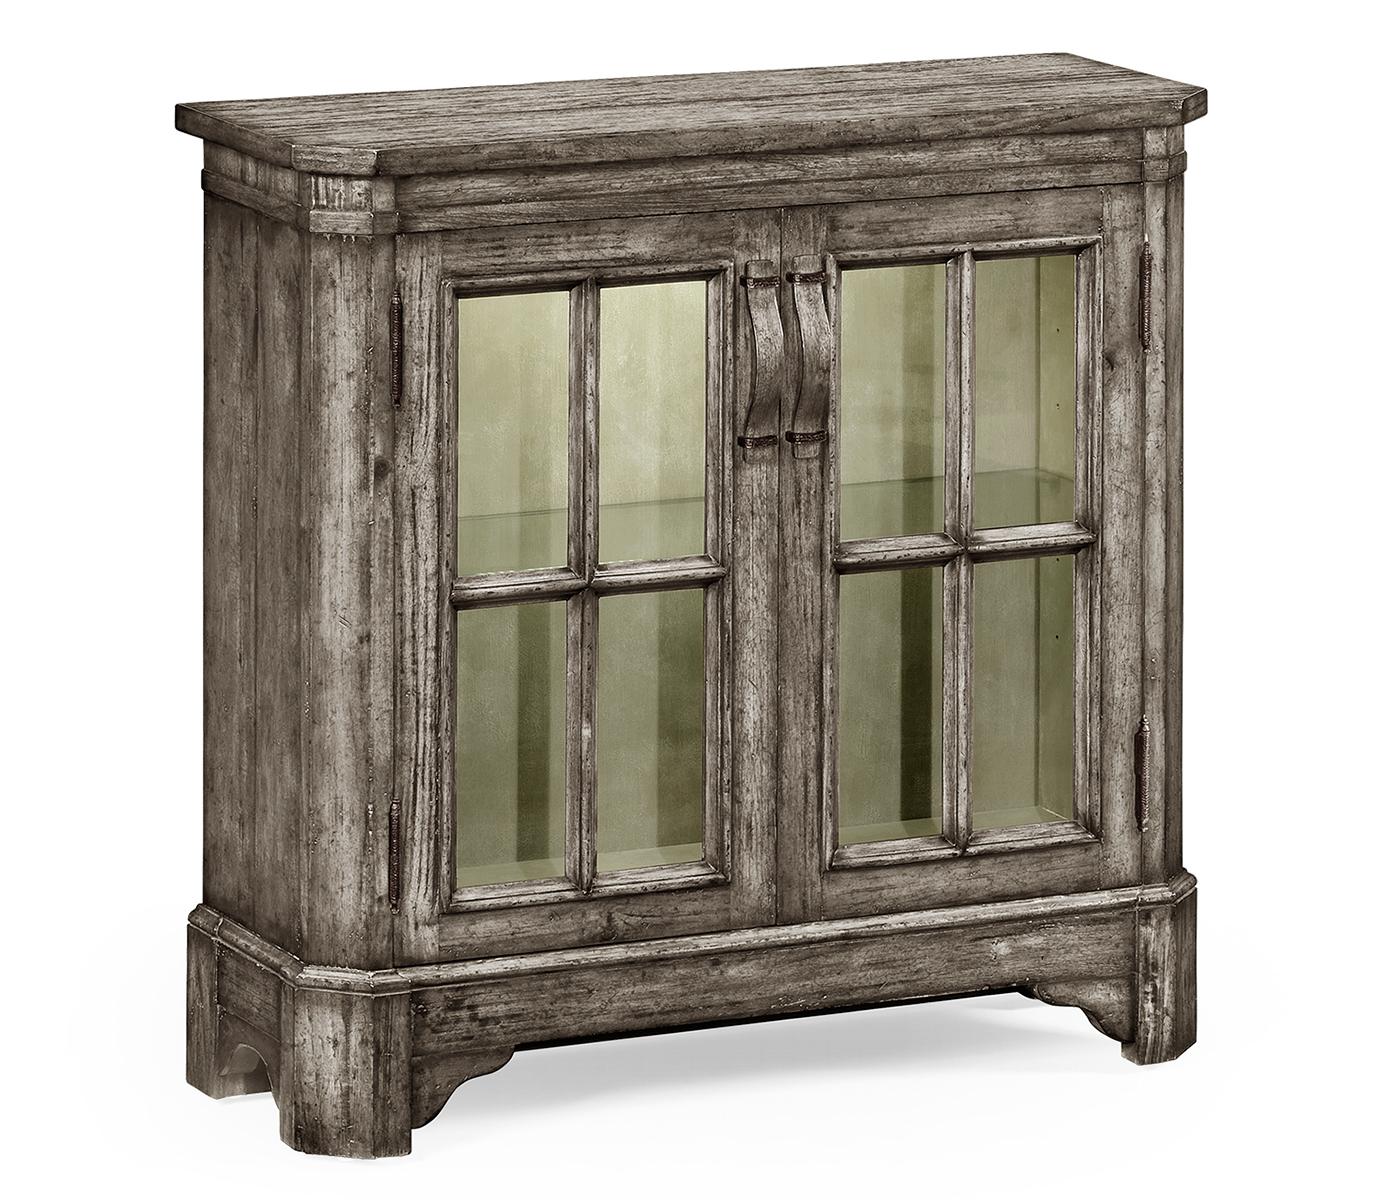 Antique Dark Grey Low Bookcase With Strap Handles